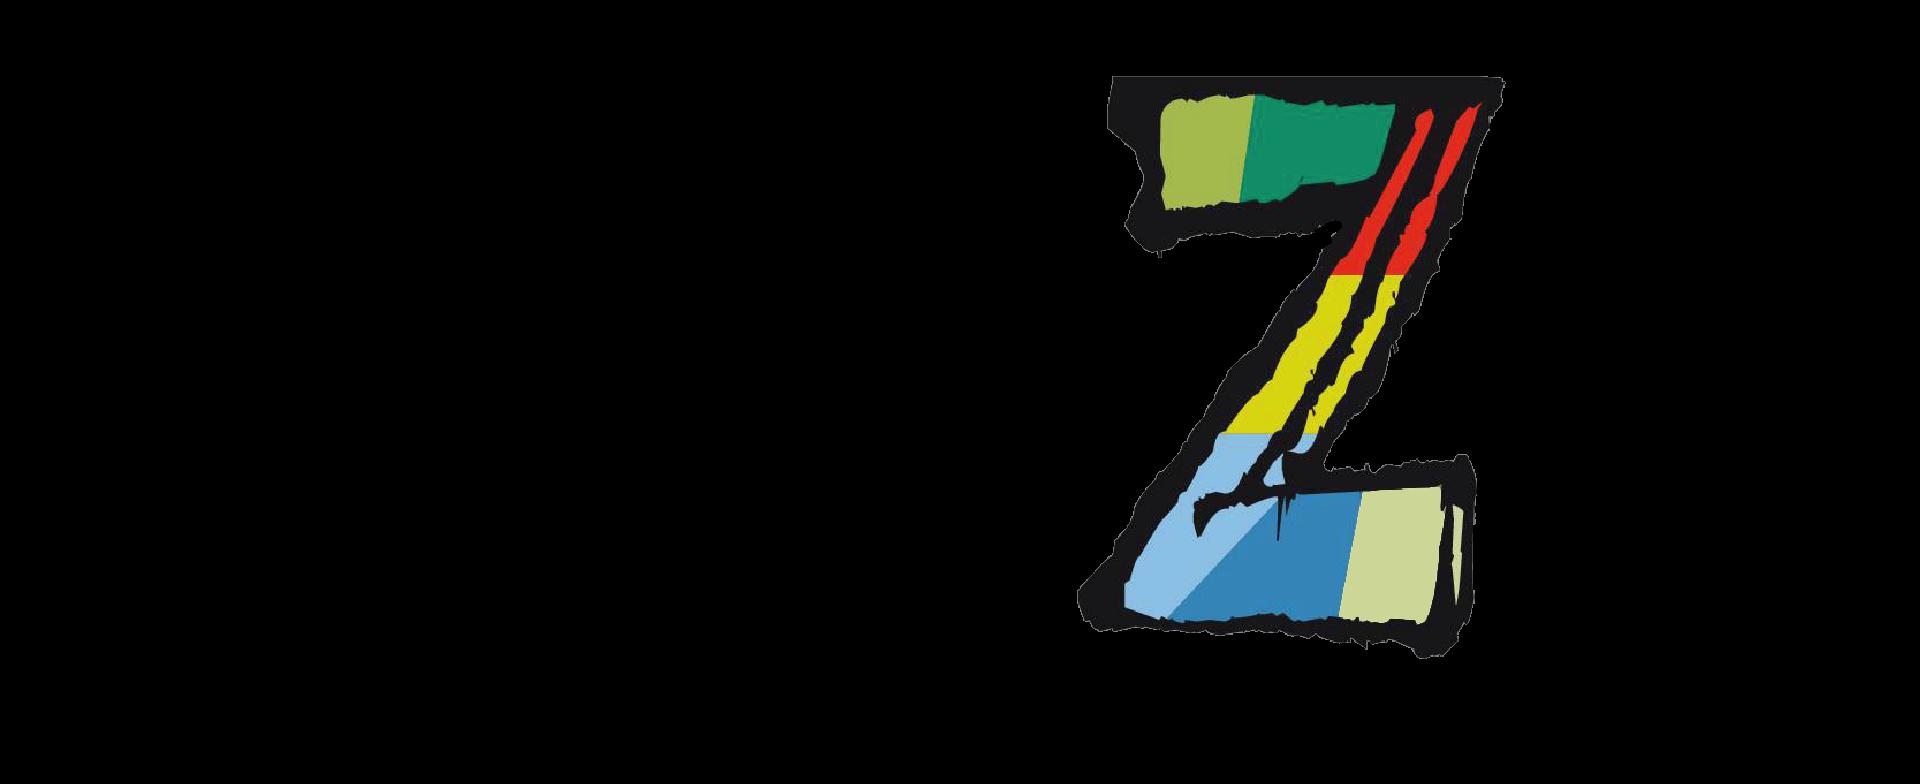 logo togezer